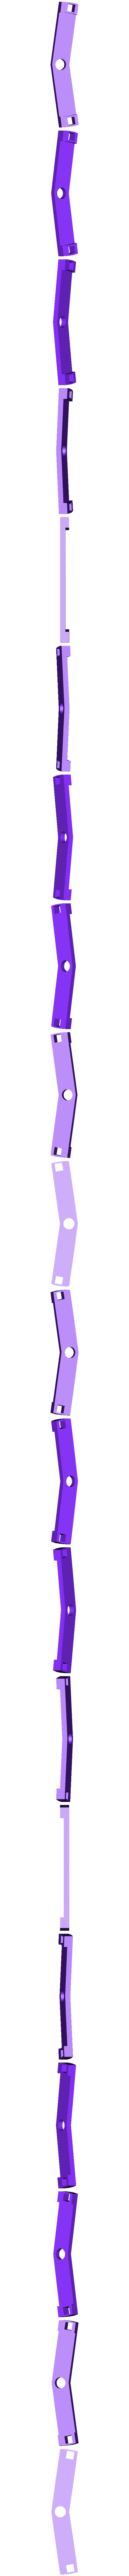 Case_Bracket.stl Download free STL file Archimedes Screw Bonanza • 3D printer design, Urulysman